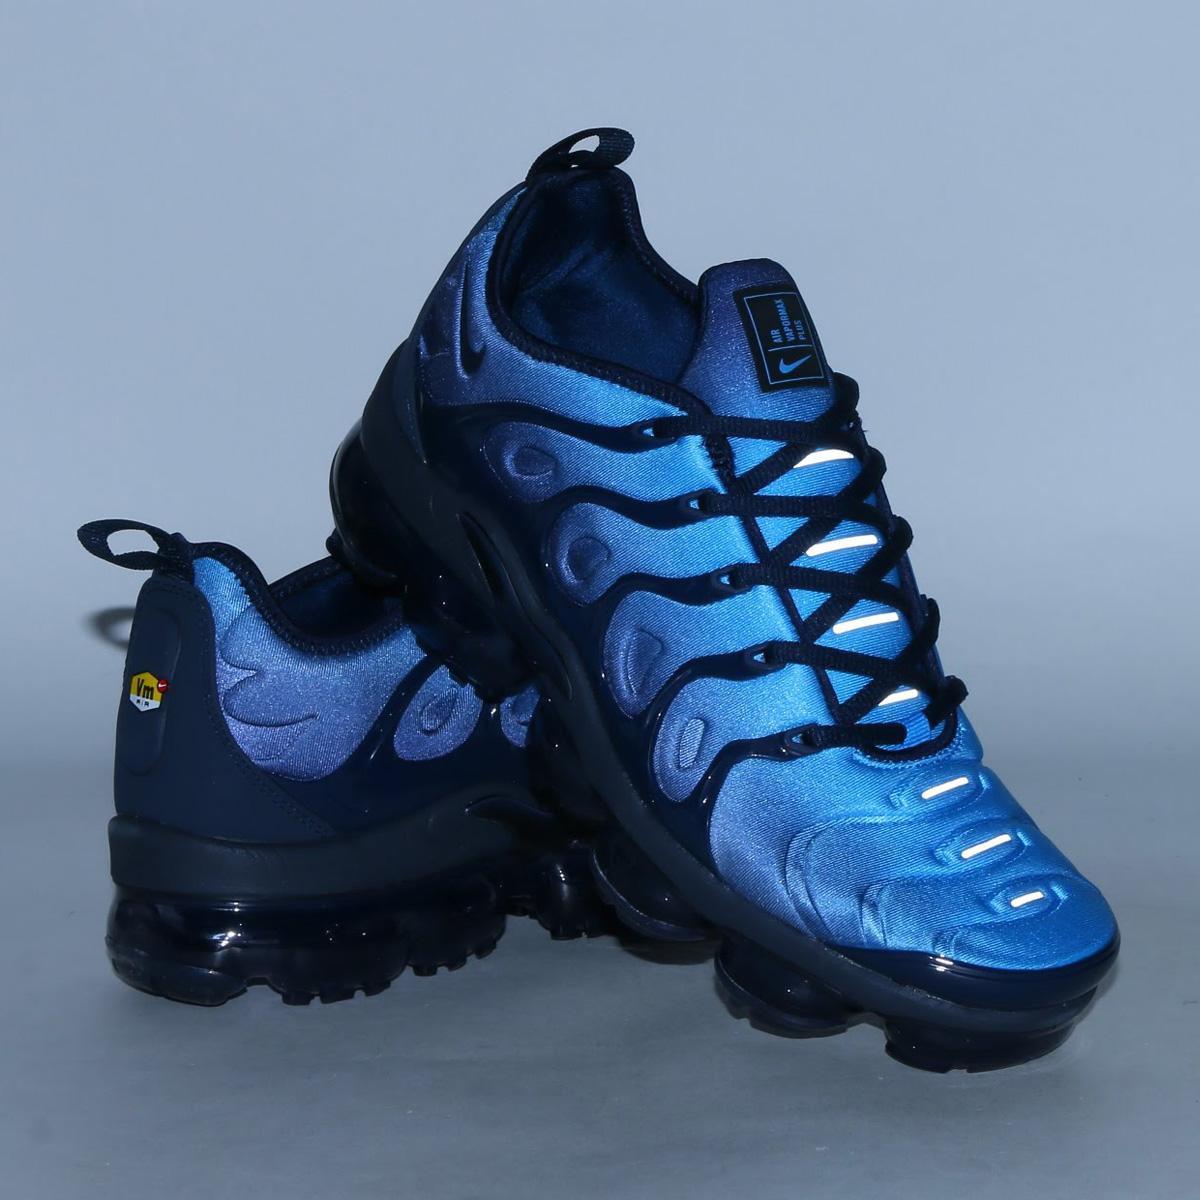 9948ccec14b NIKE AIR VAPORMAX PLUS (Nike air vapor max plus) (OBSIDIAN OBSIDIAN-PHOTO  BLUE-BLACK) 18SP-S